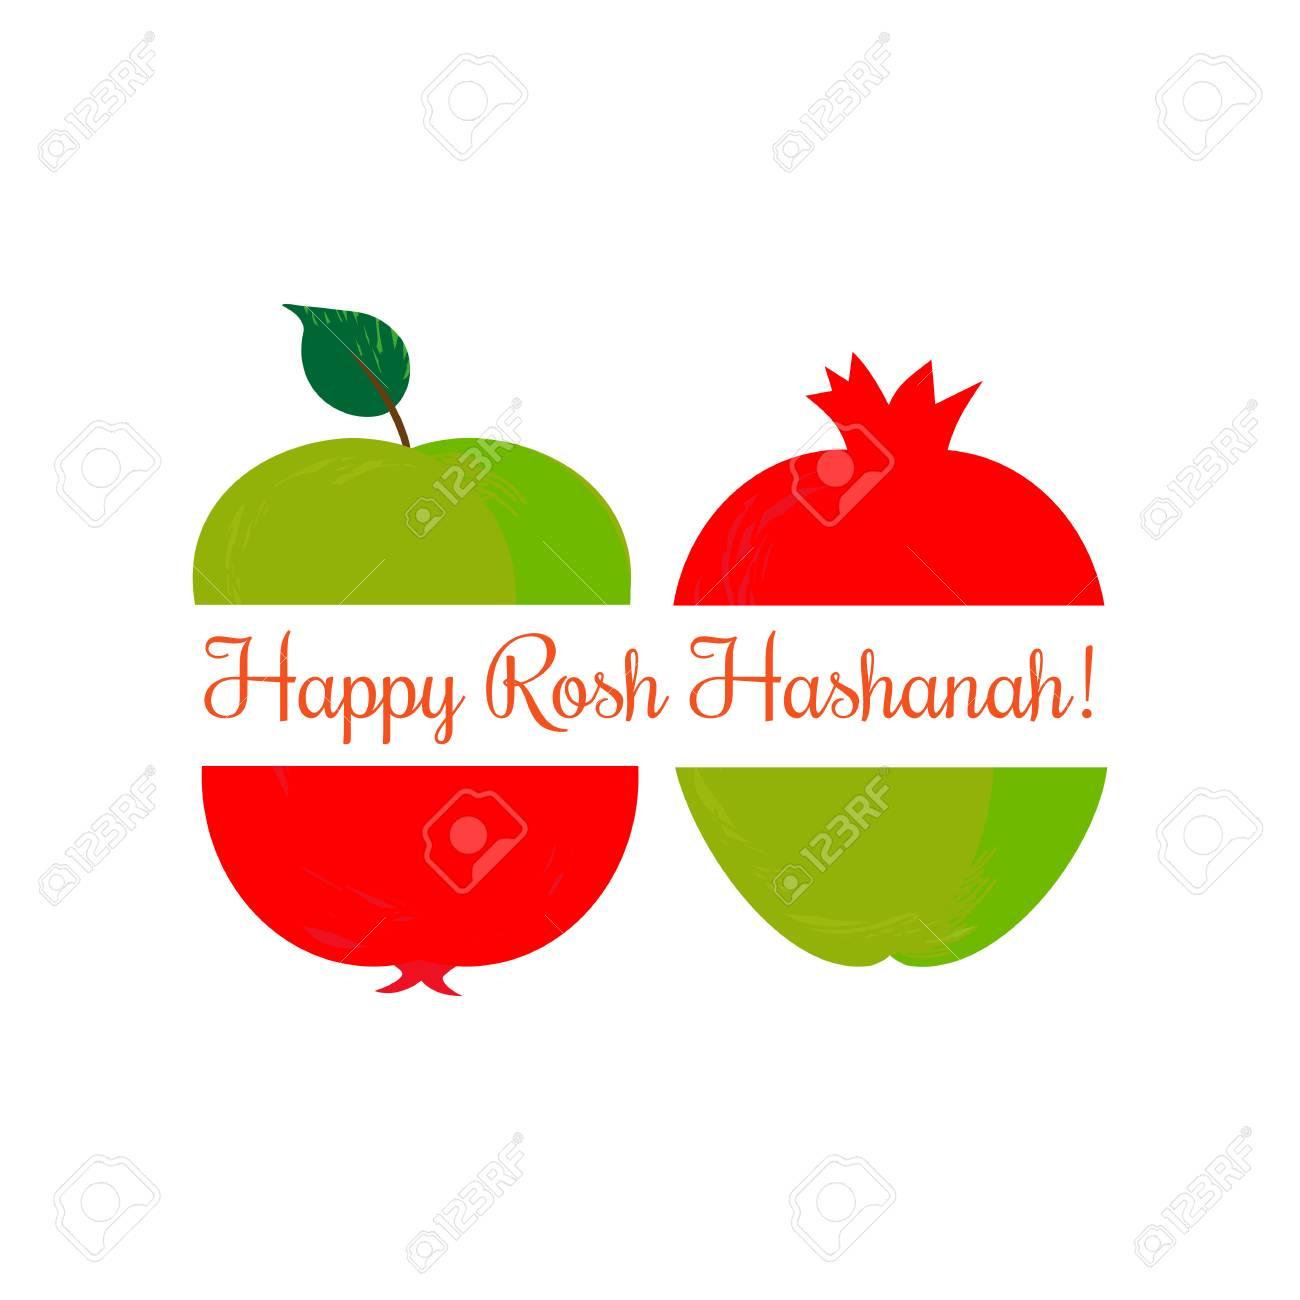 Rosh Hashanah Jewish New Year Concept Traditional Holiday Symbols